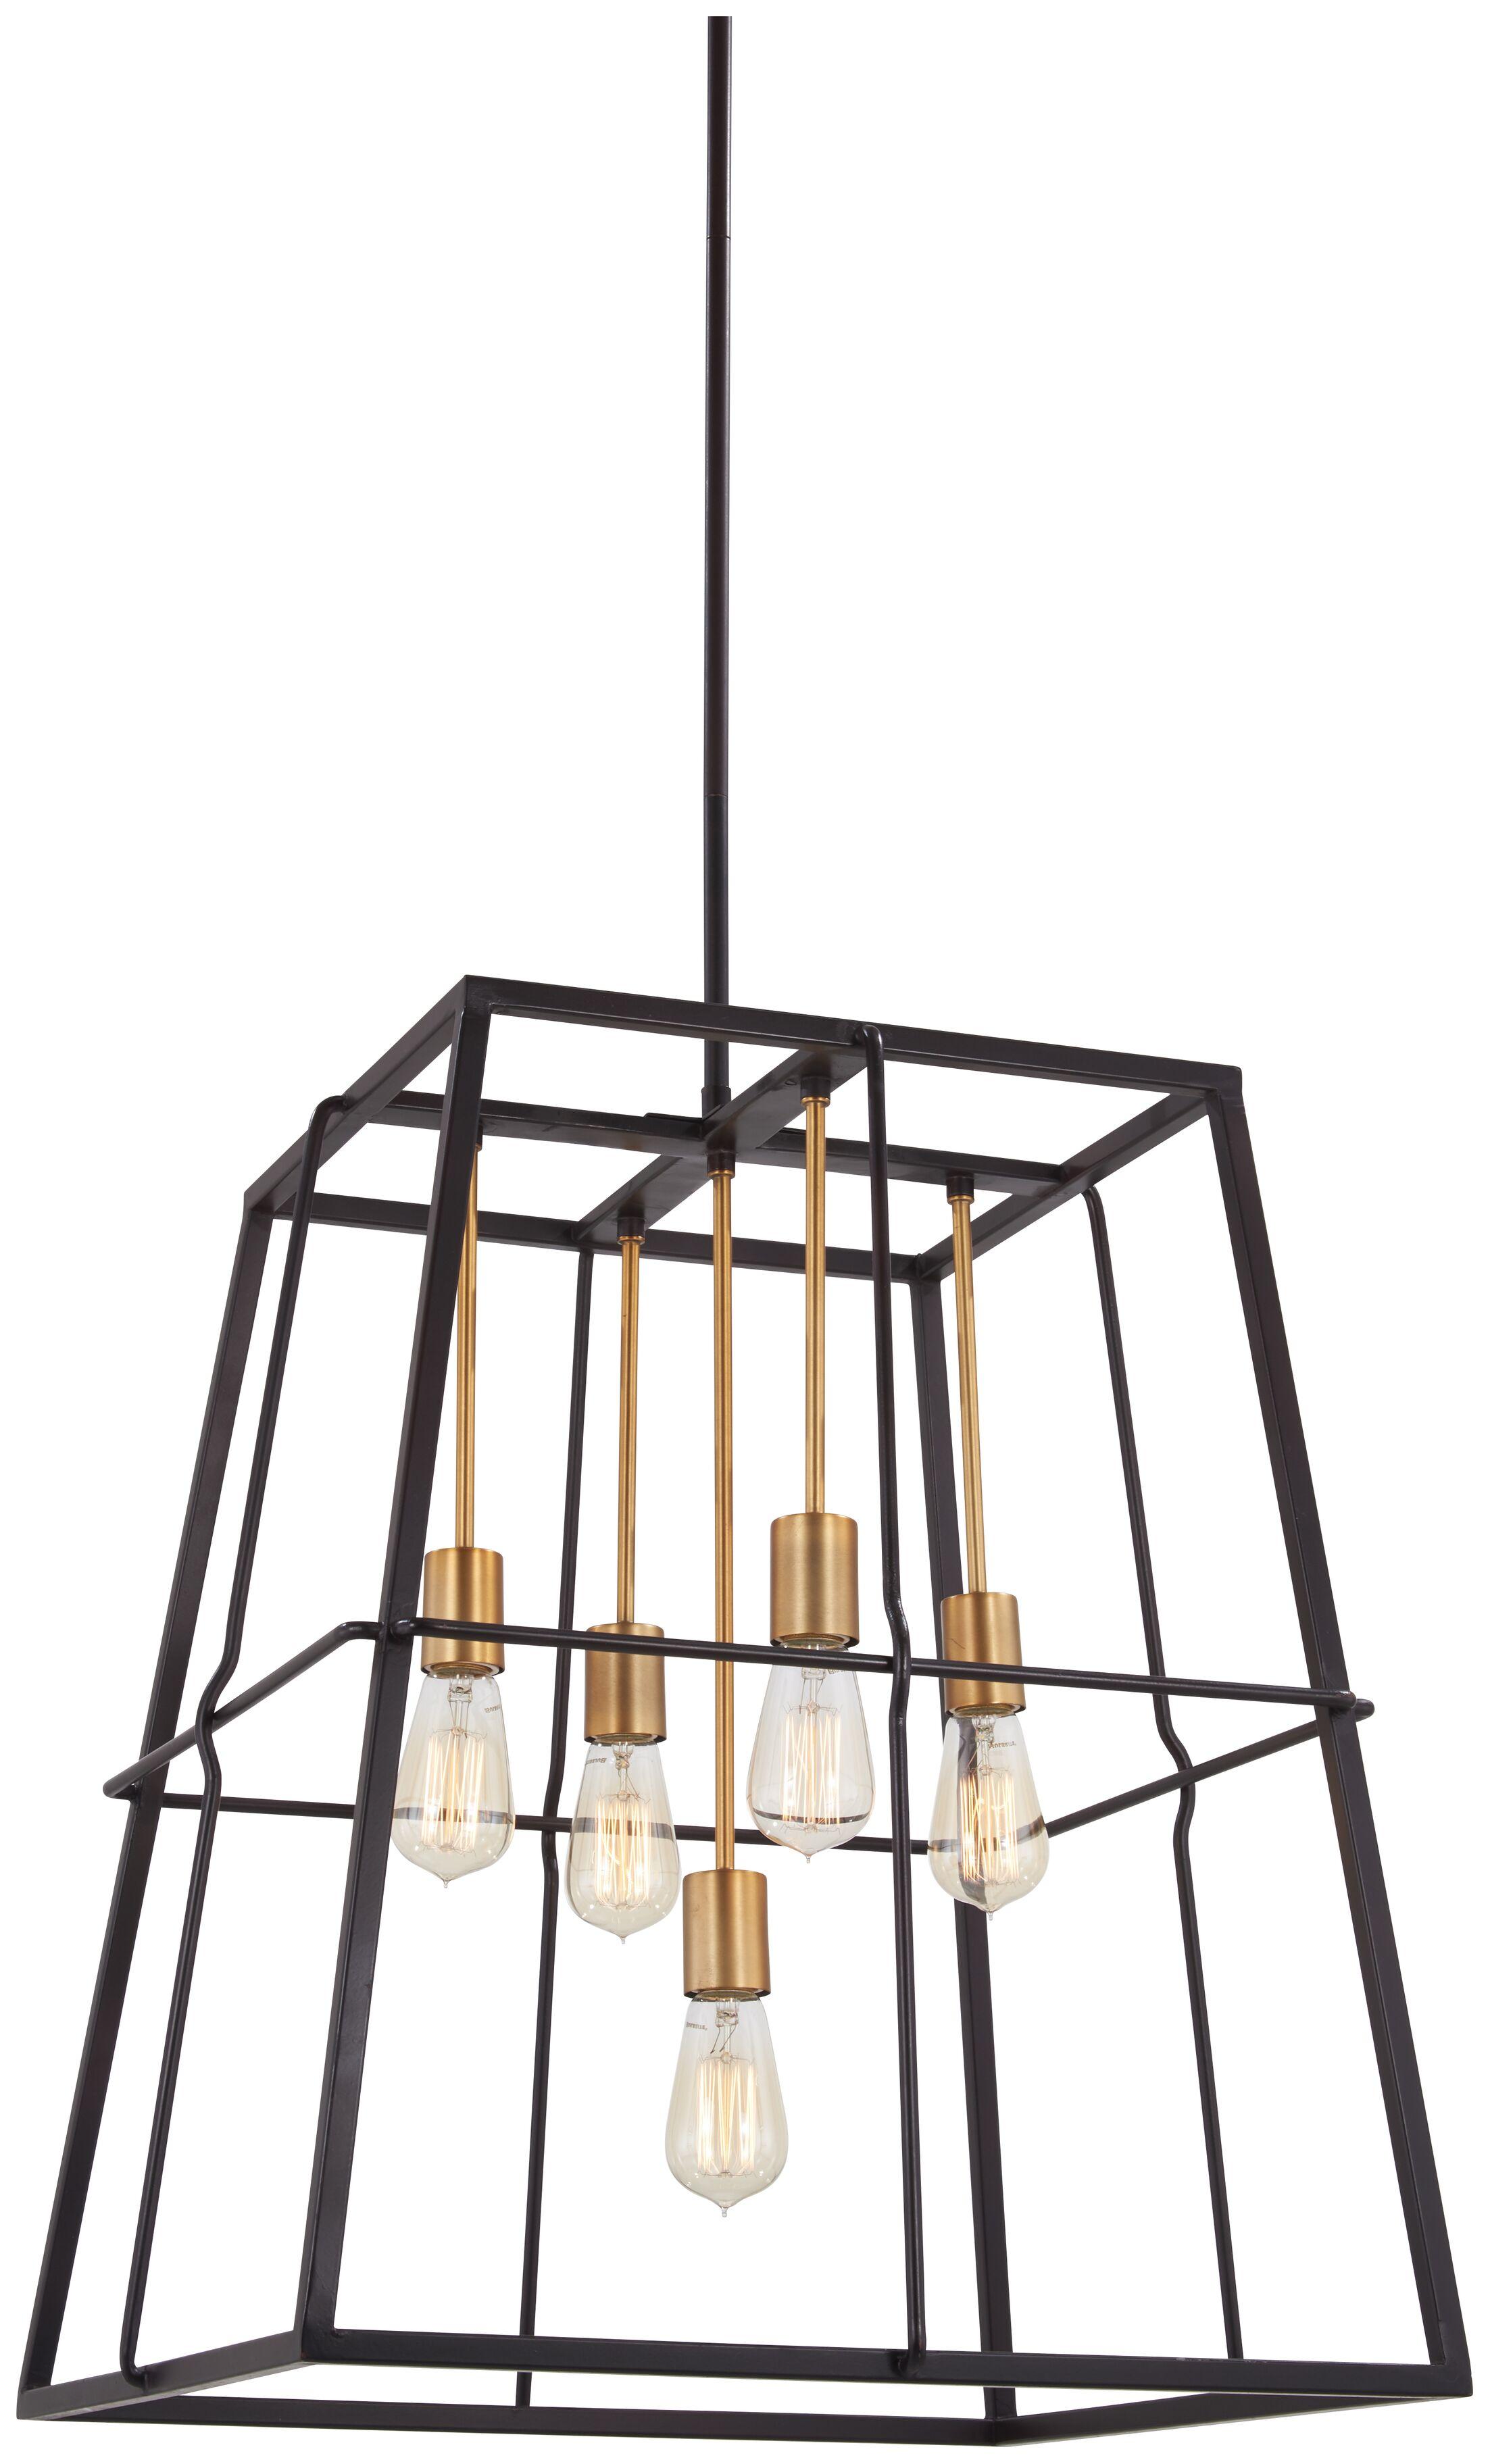 Croyle 5-Light Geometric Chandelier